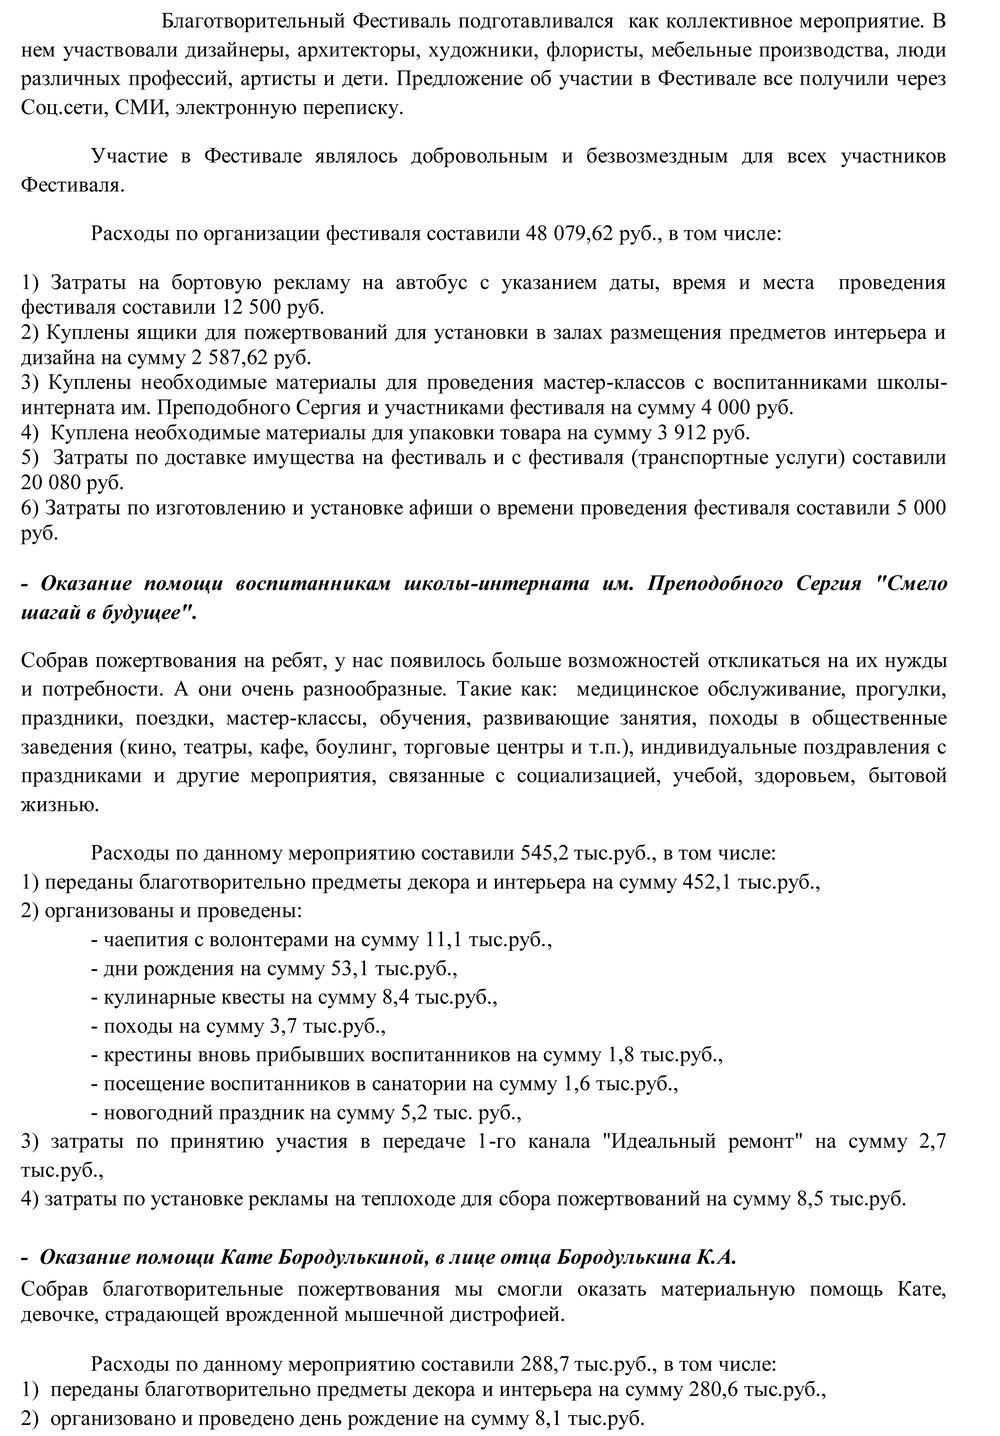 Отчет 2017 уточ3.jpg